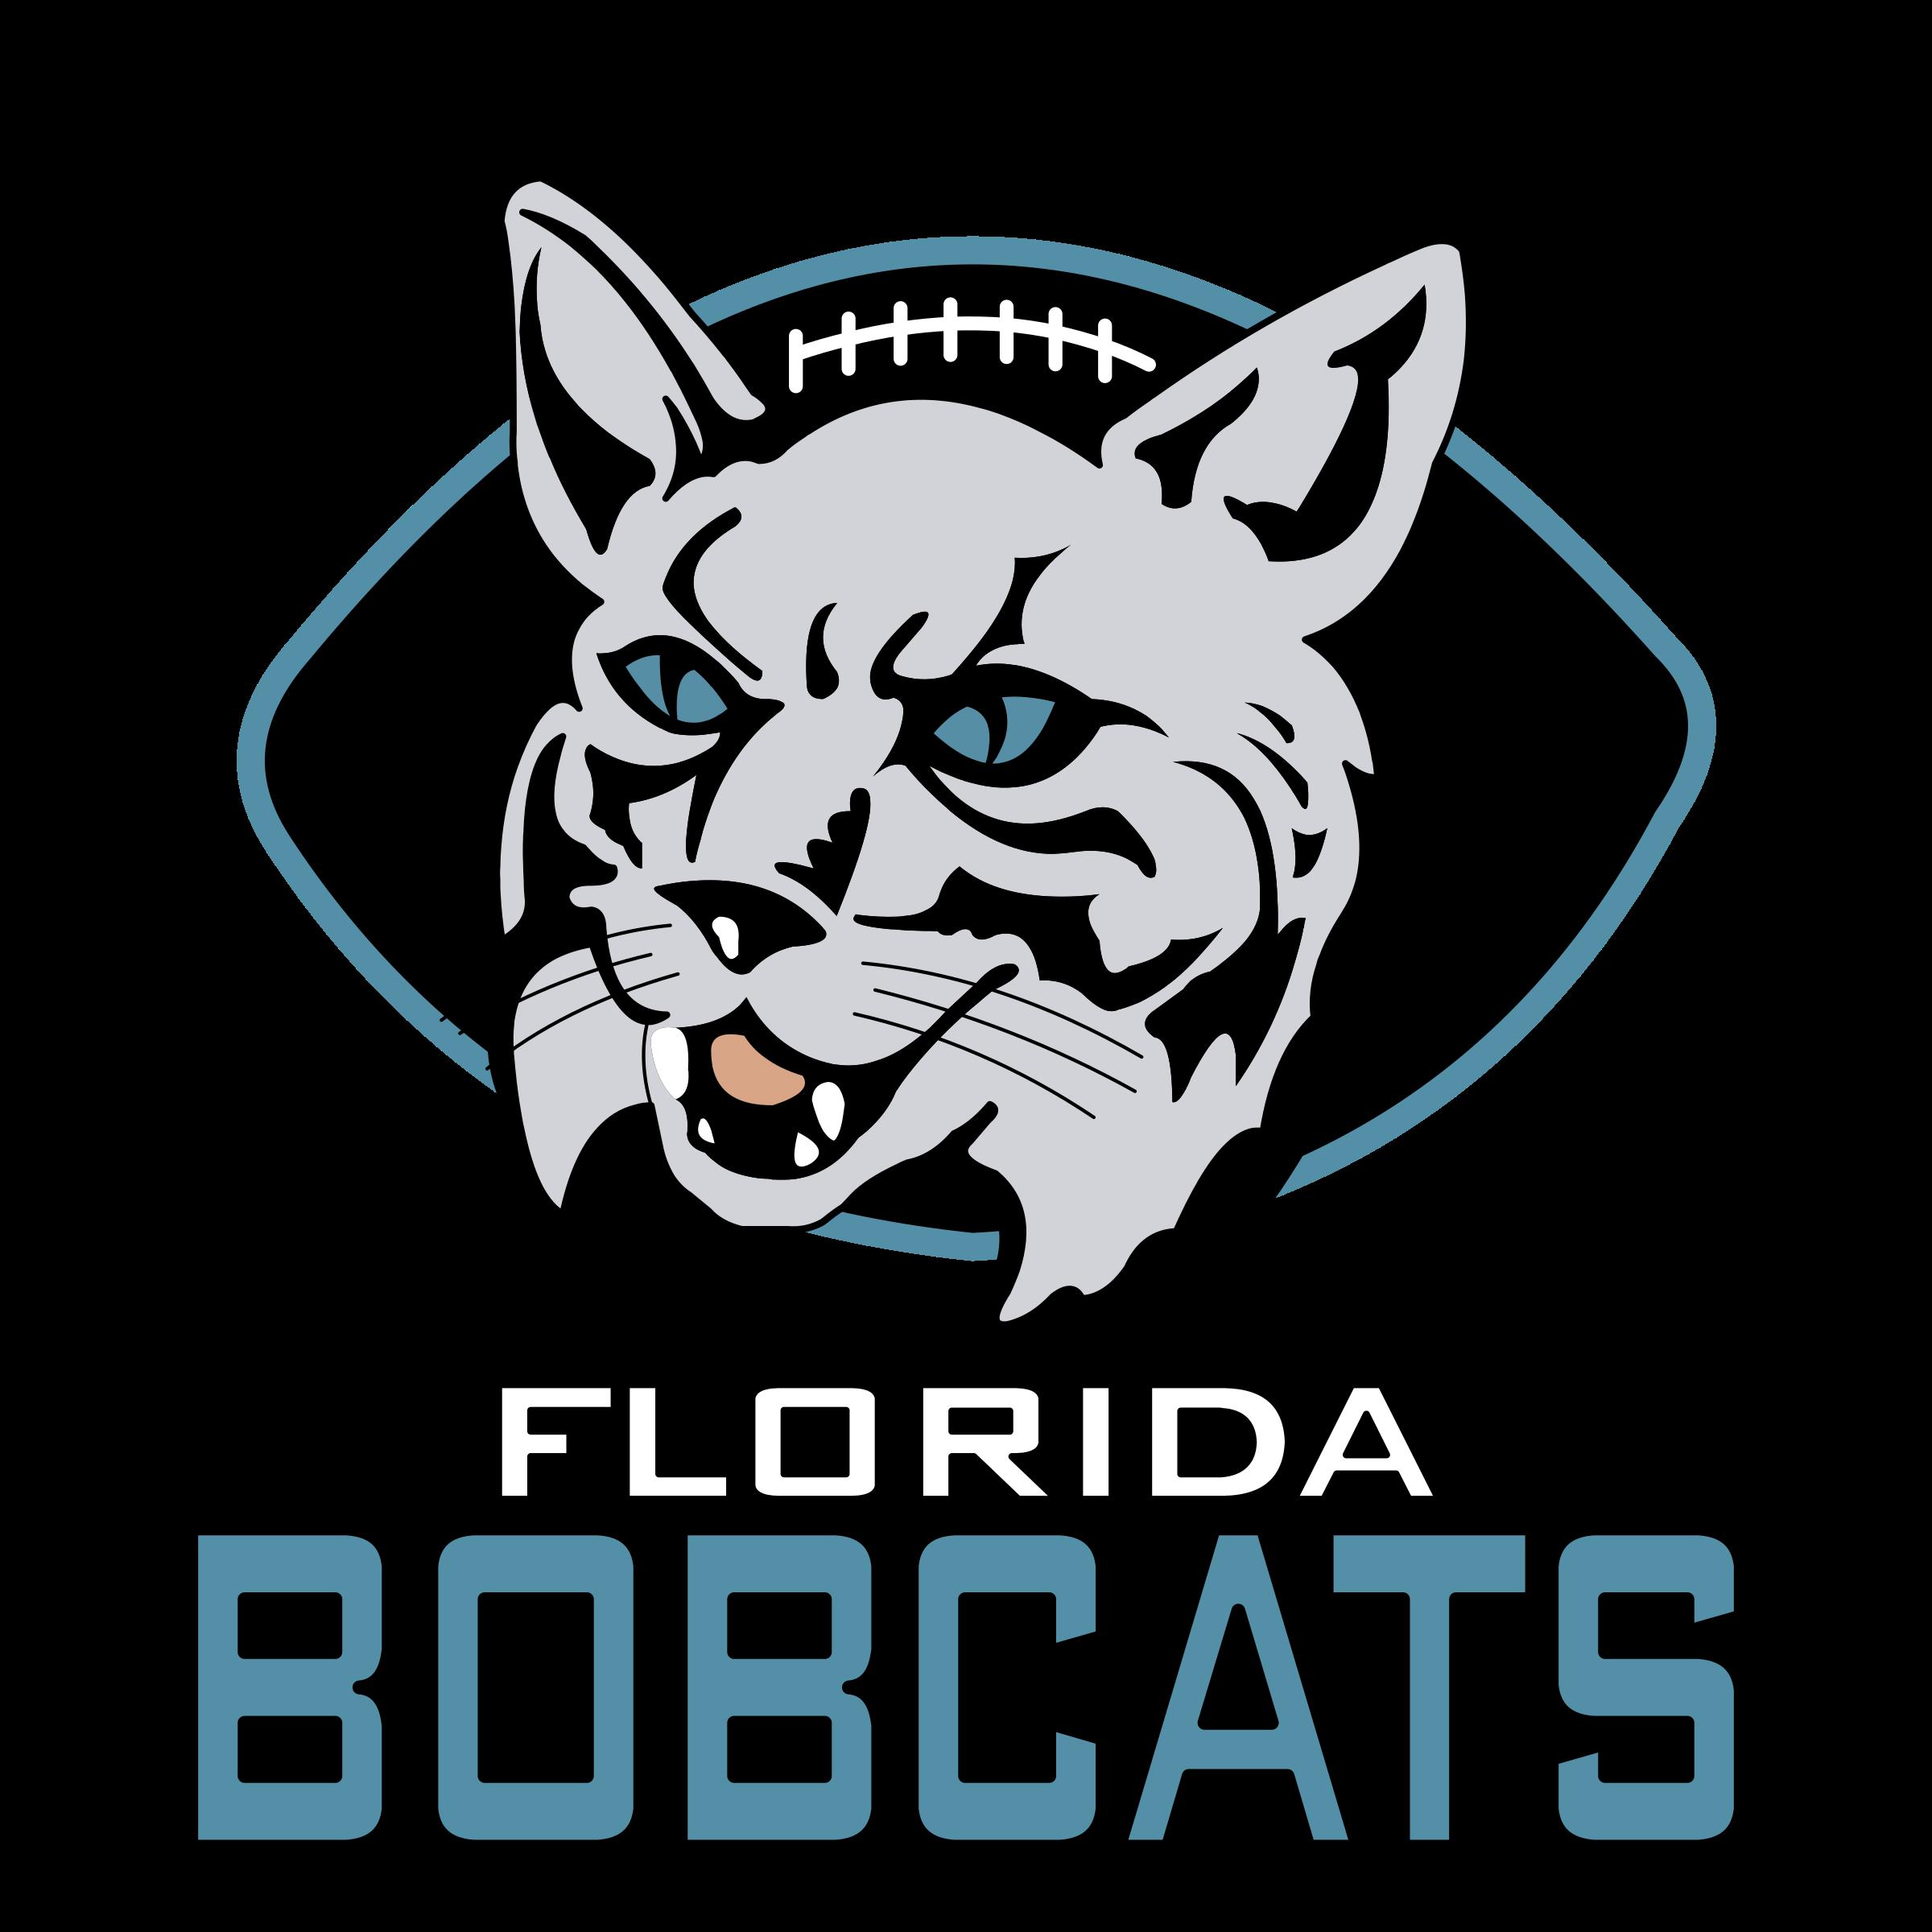 Florida Bobcats Logo PNG Transparent & SVG Vector ...